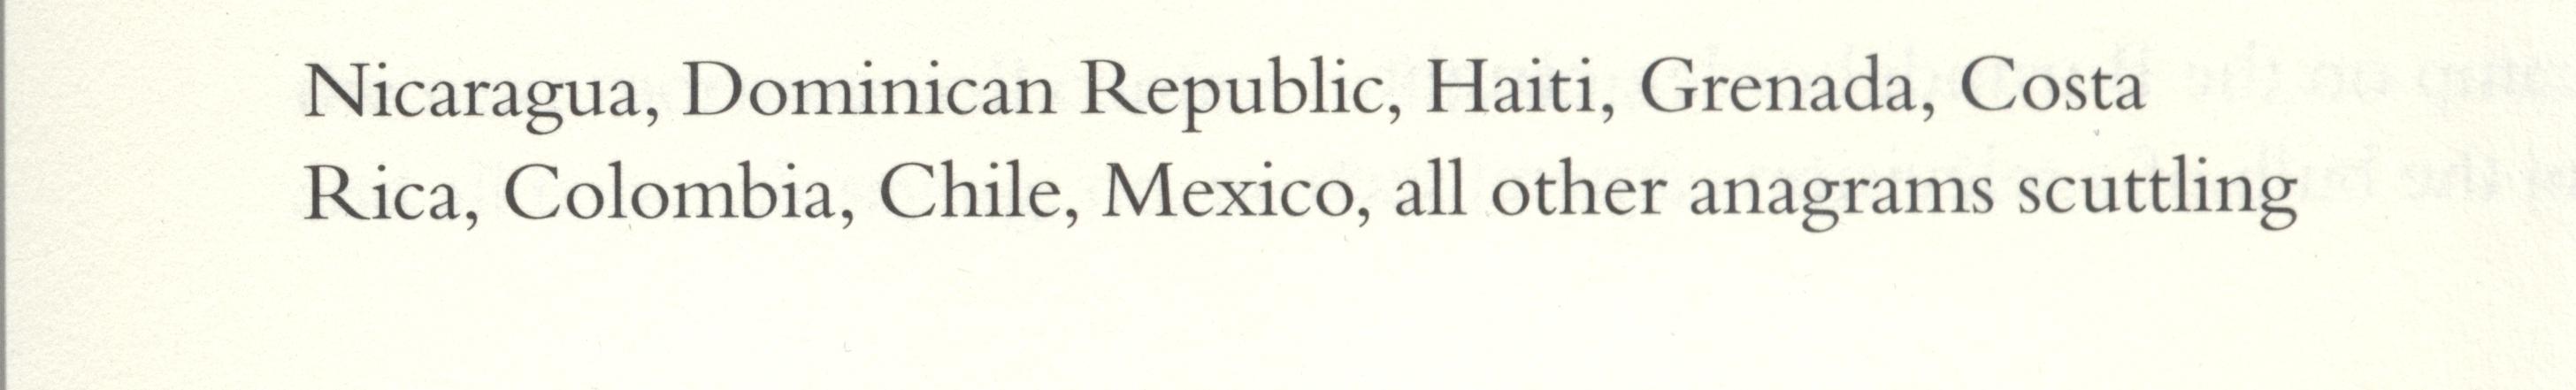 Willem Blaeu's 'Newly Described Africa